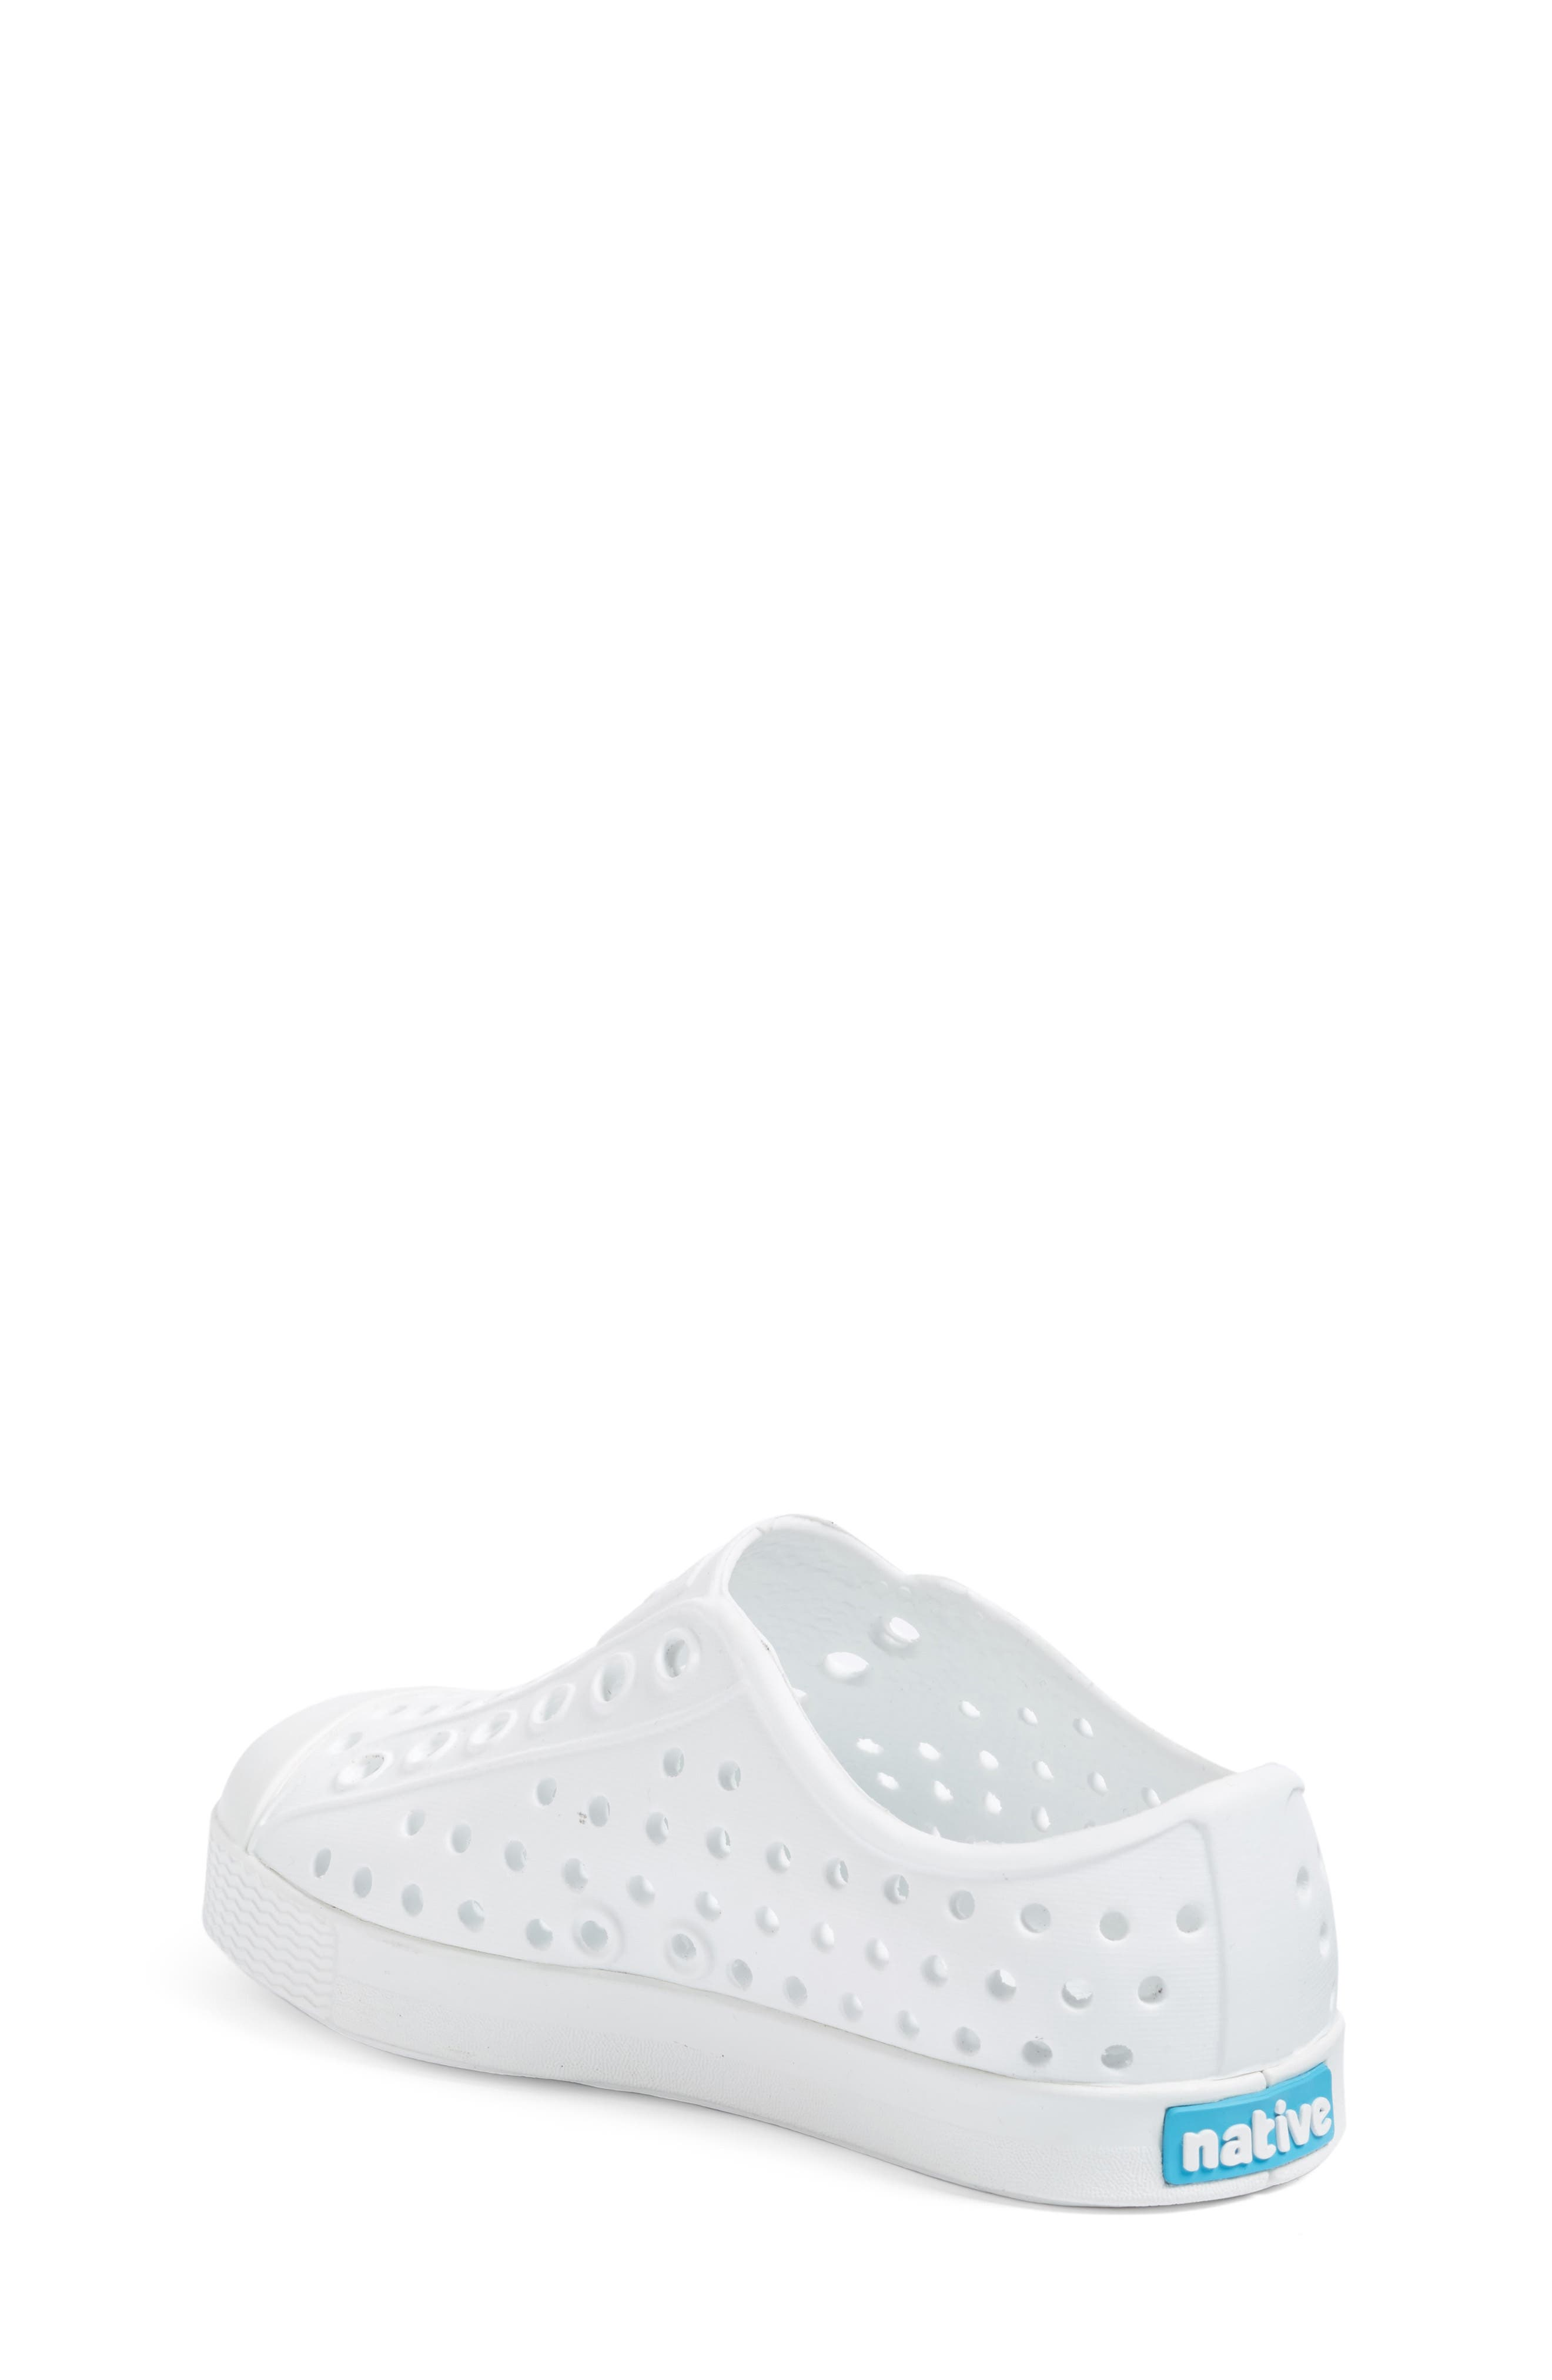 'Jefferson' Water Friendly Slip-On Sneaker,                             Alternate thumbnail 92, color,